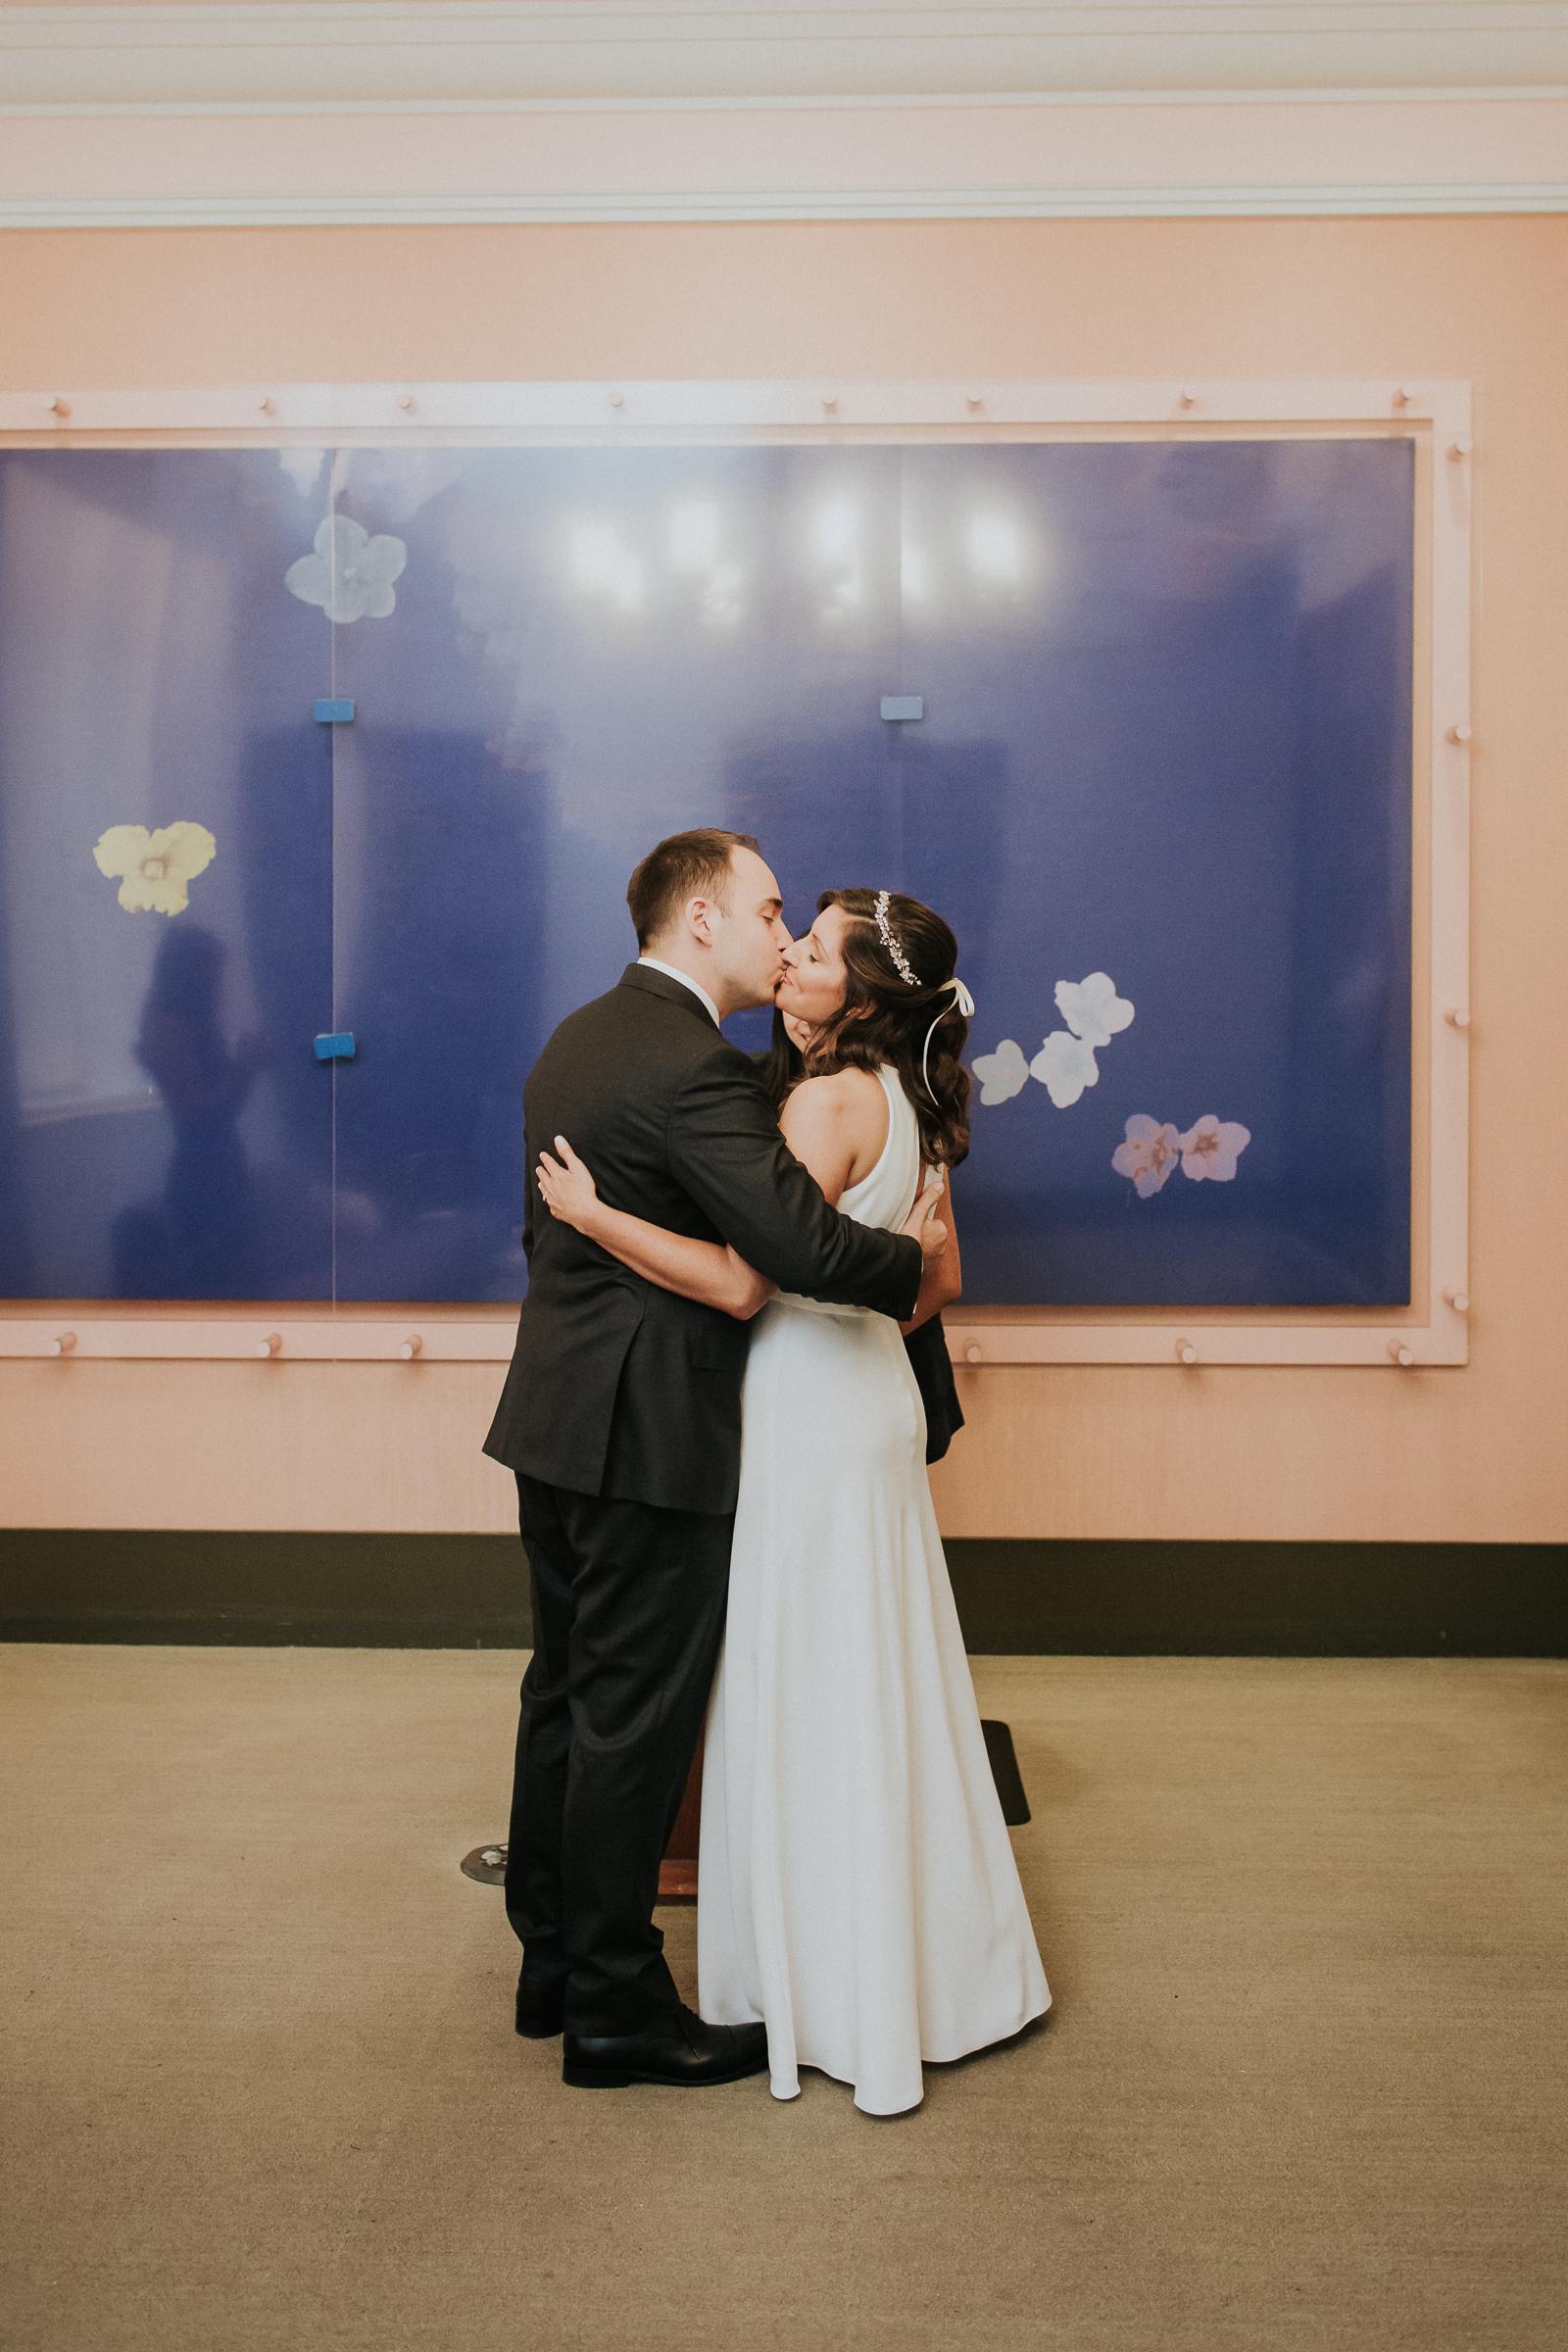 Casa-Apicii-Intimate-Wedding-City-Hall-Elopement-New-York-Documentary-Wedding-Photographer-14.jpg